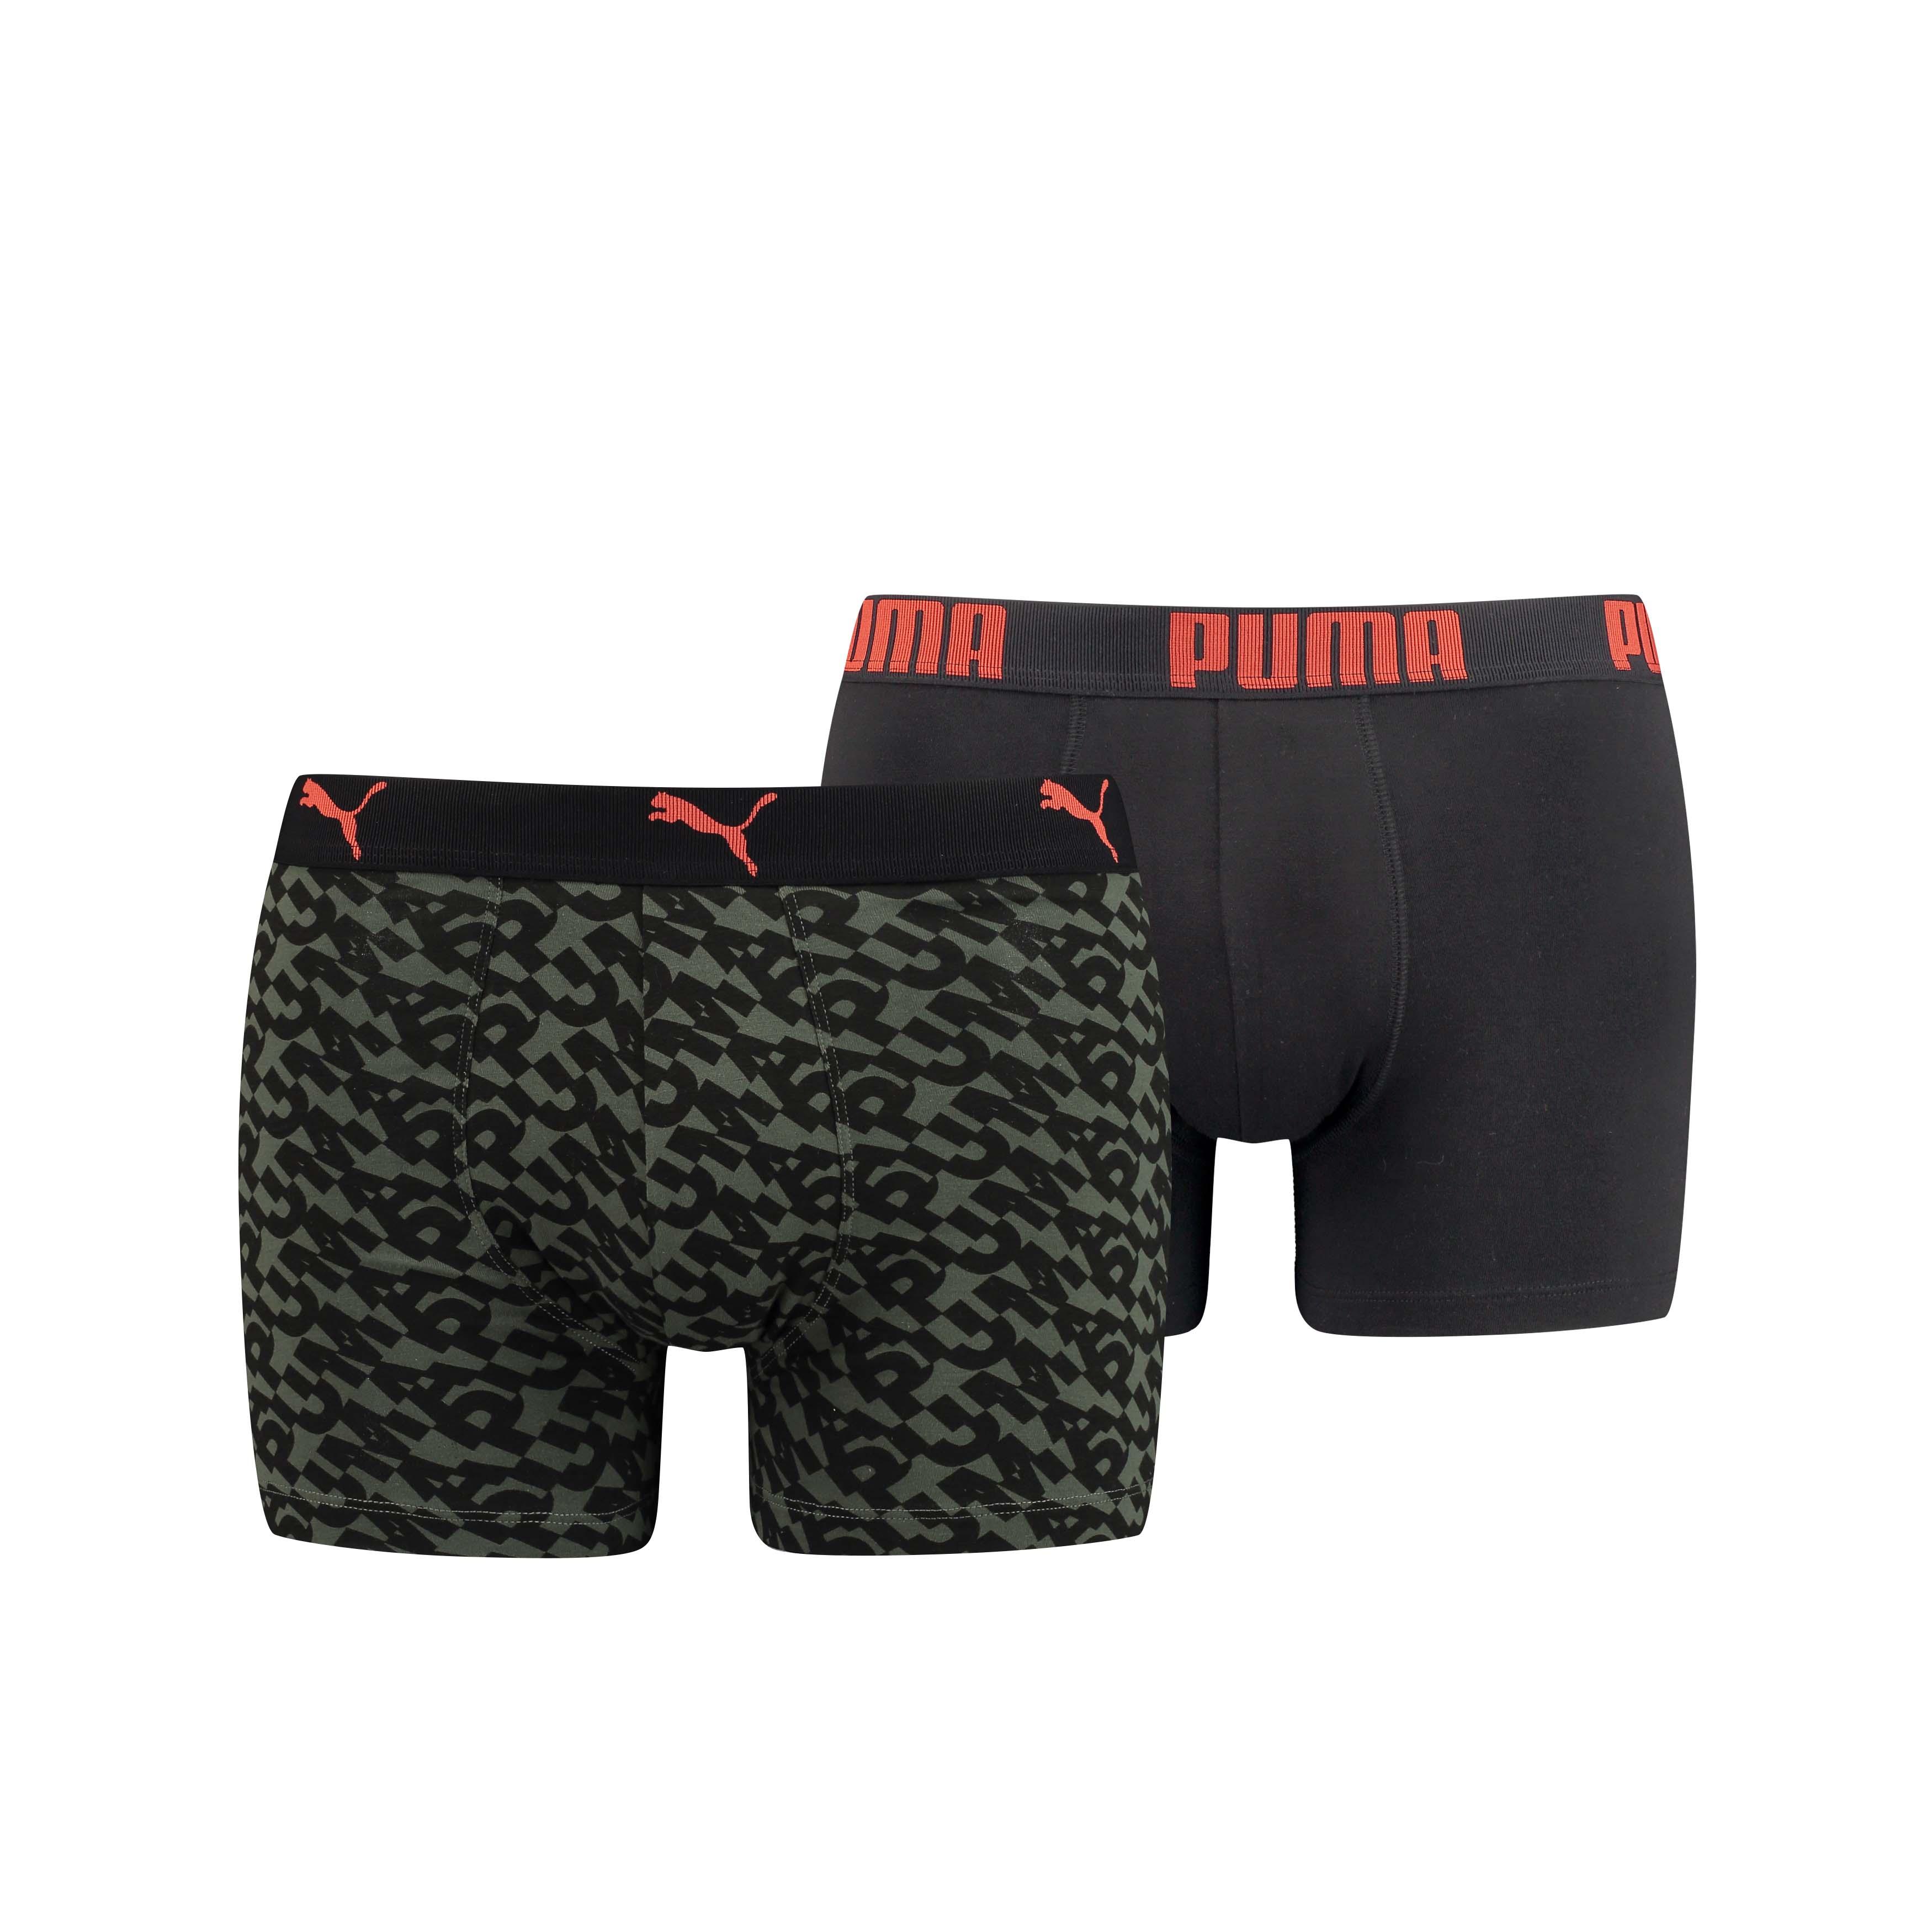 Puma Boxershorts Logo AOP Army Green 2-pack-L